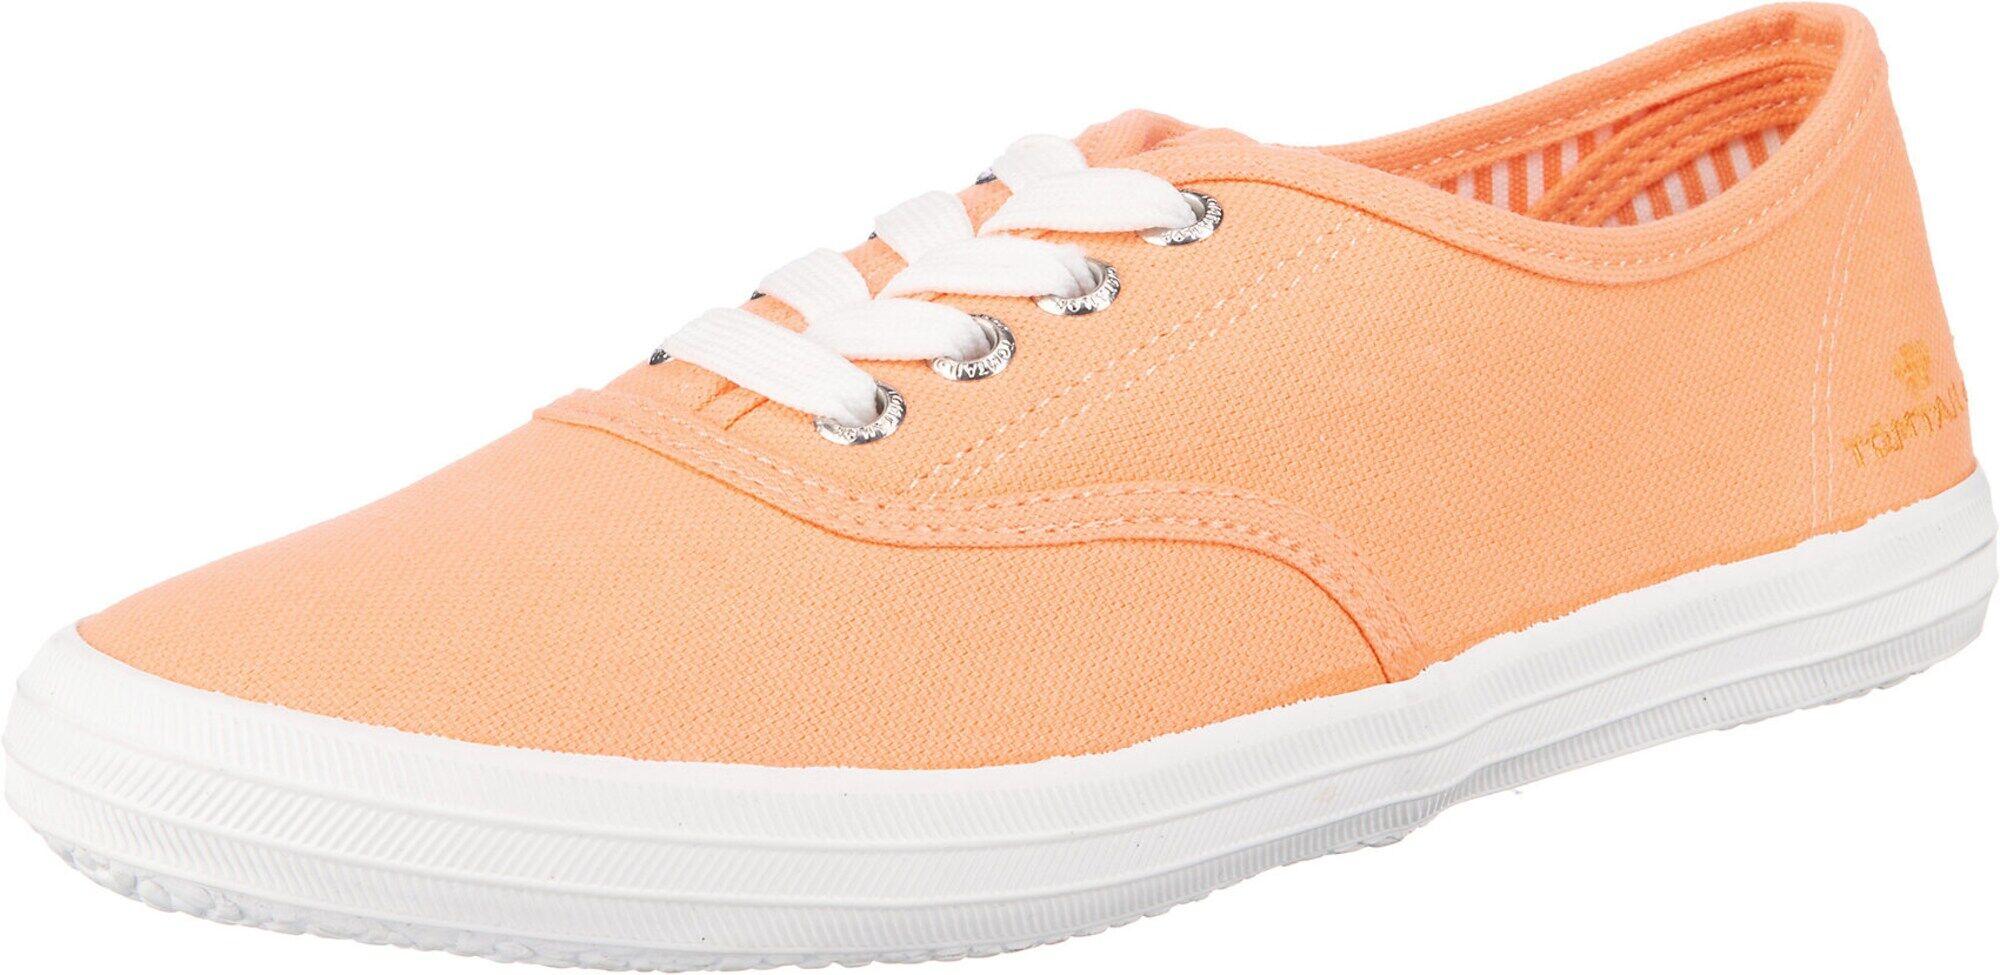 TOM TAILOR Baskets basses  - Orange - Taille: 40 - female